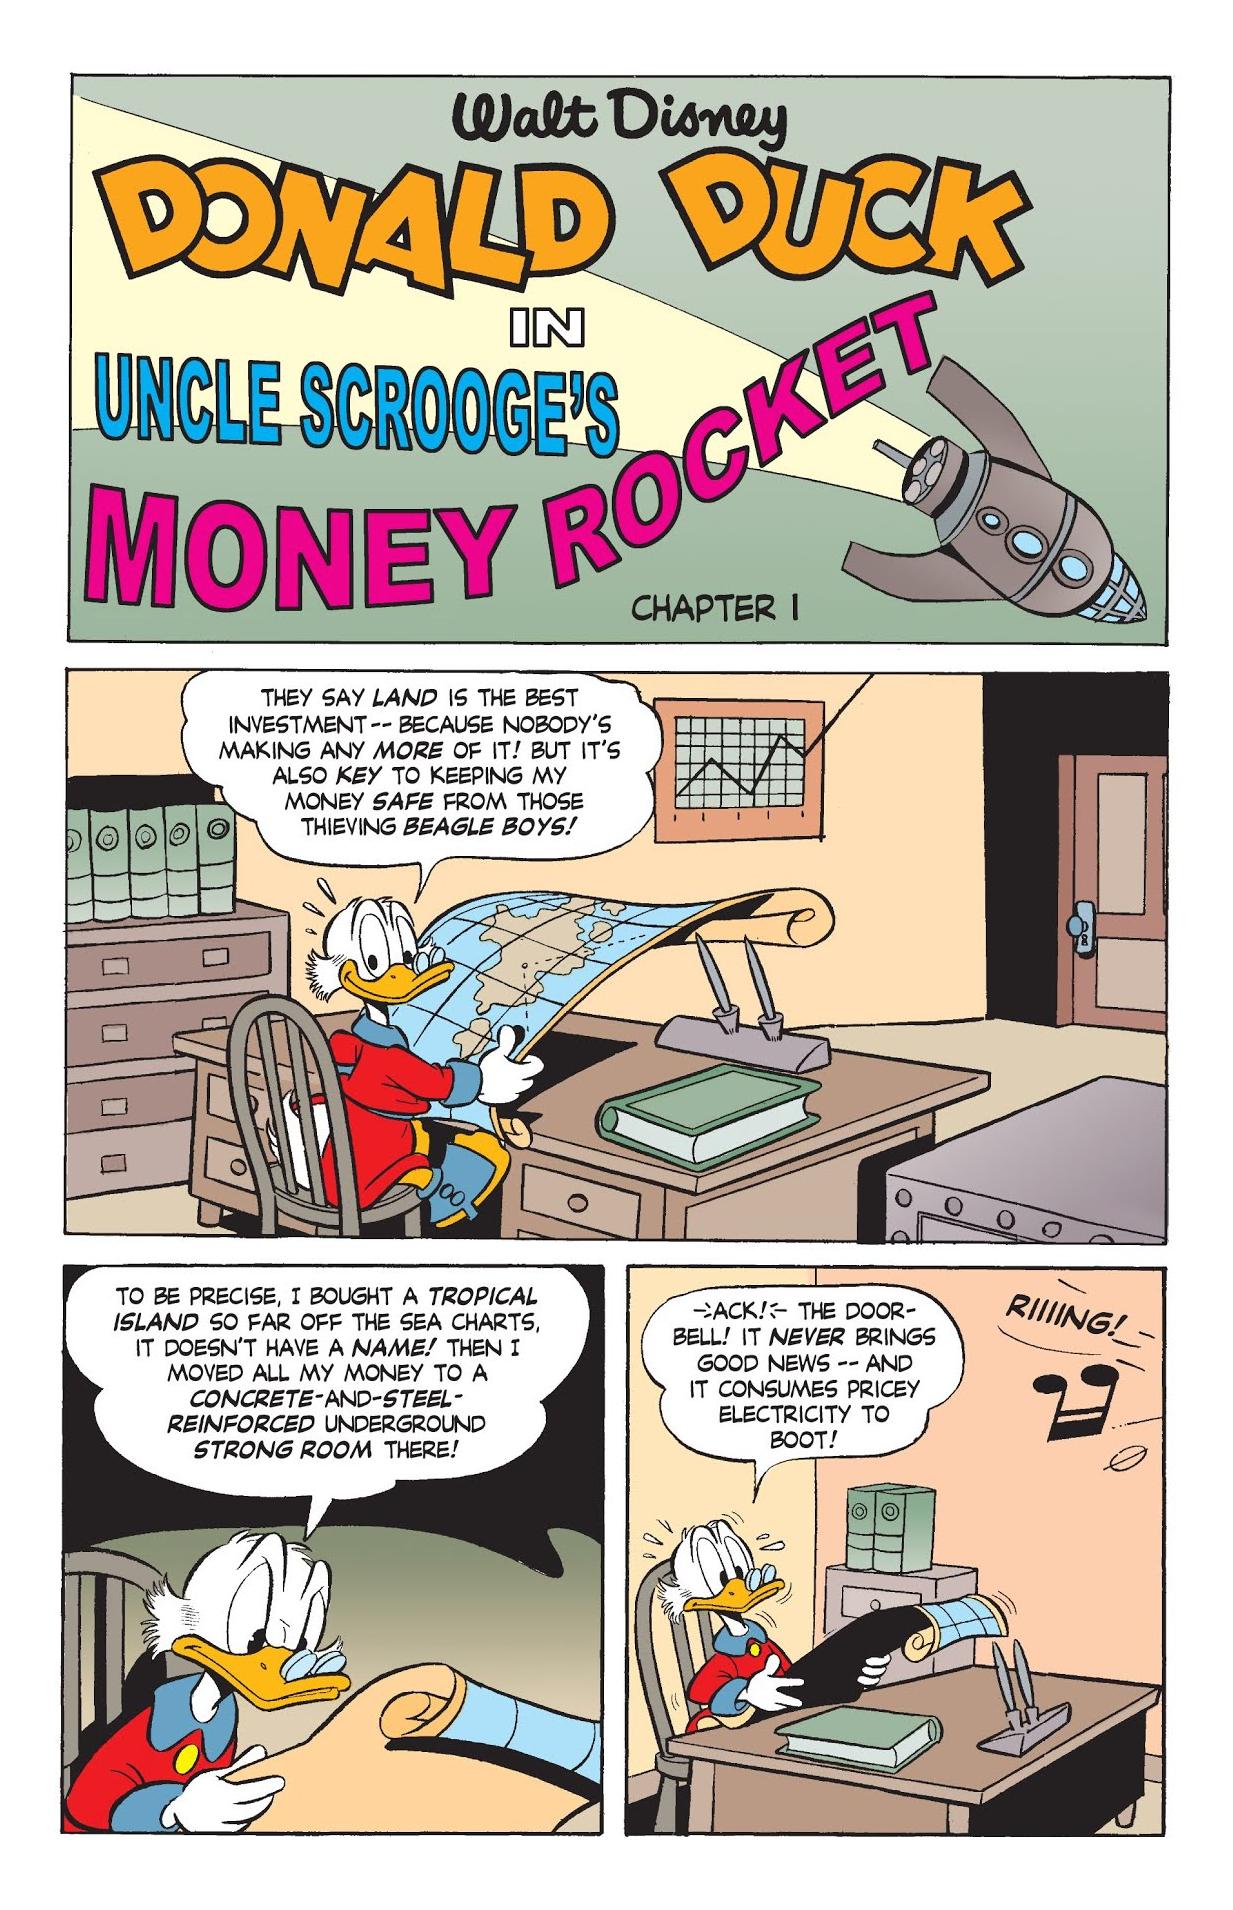 Uncle Scrooge's Money Rocket